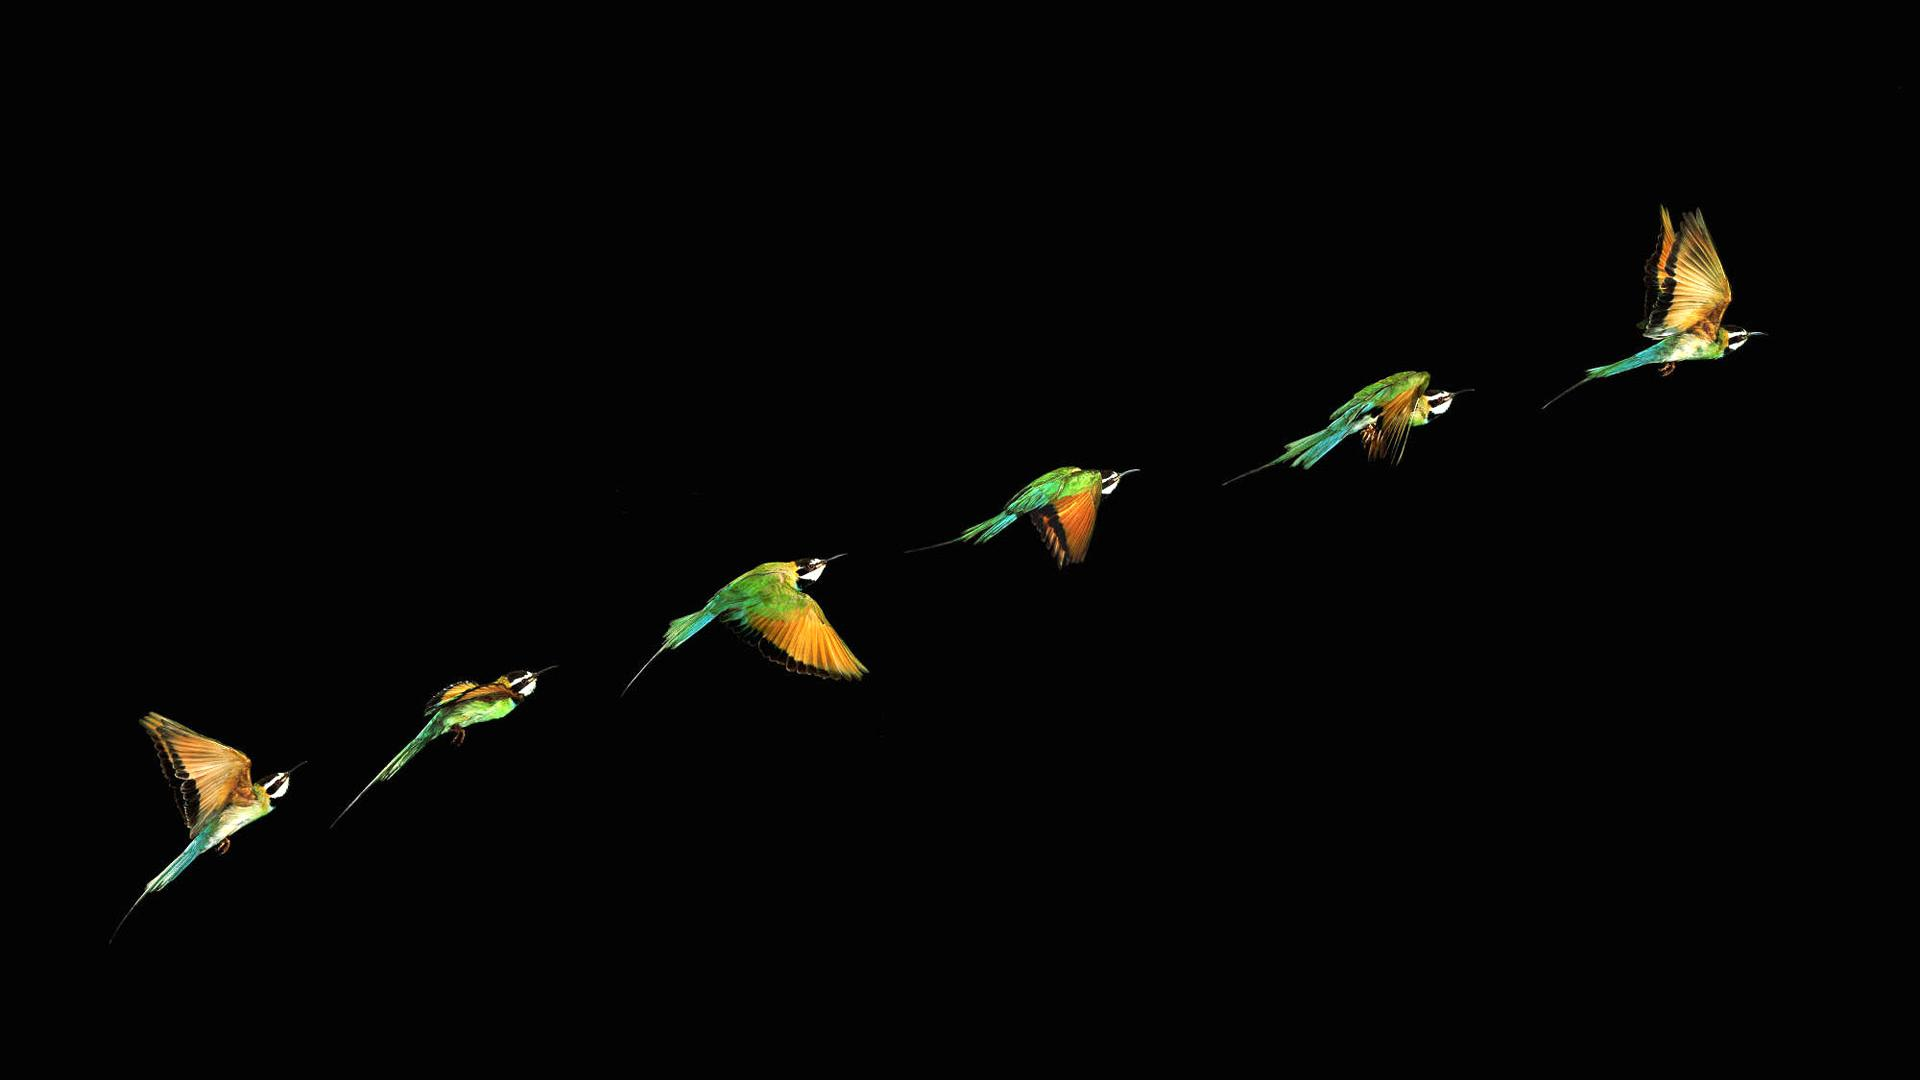 wallpaper birds wallpapers 1920x1080 1920x1080